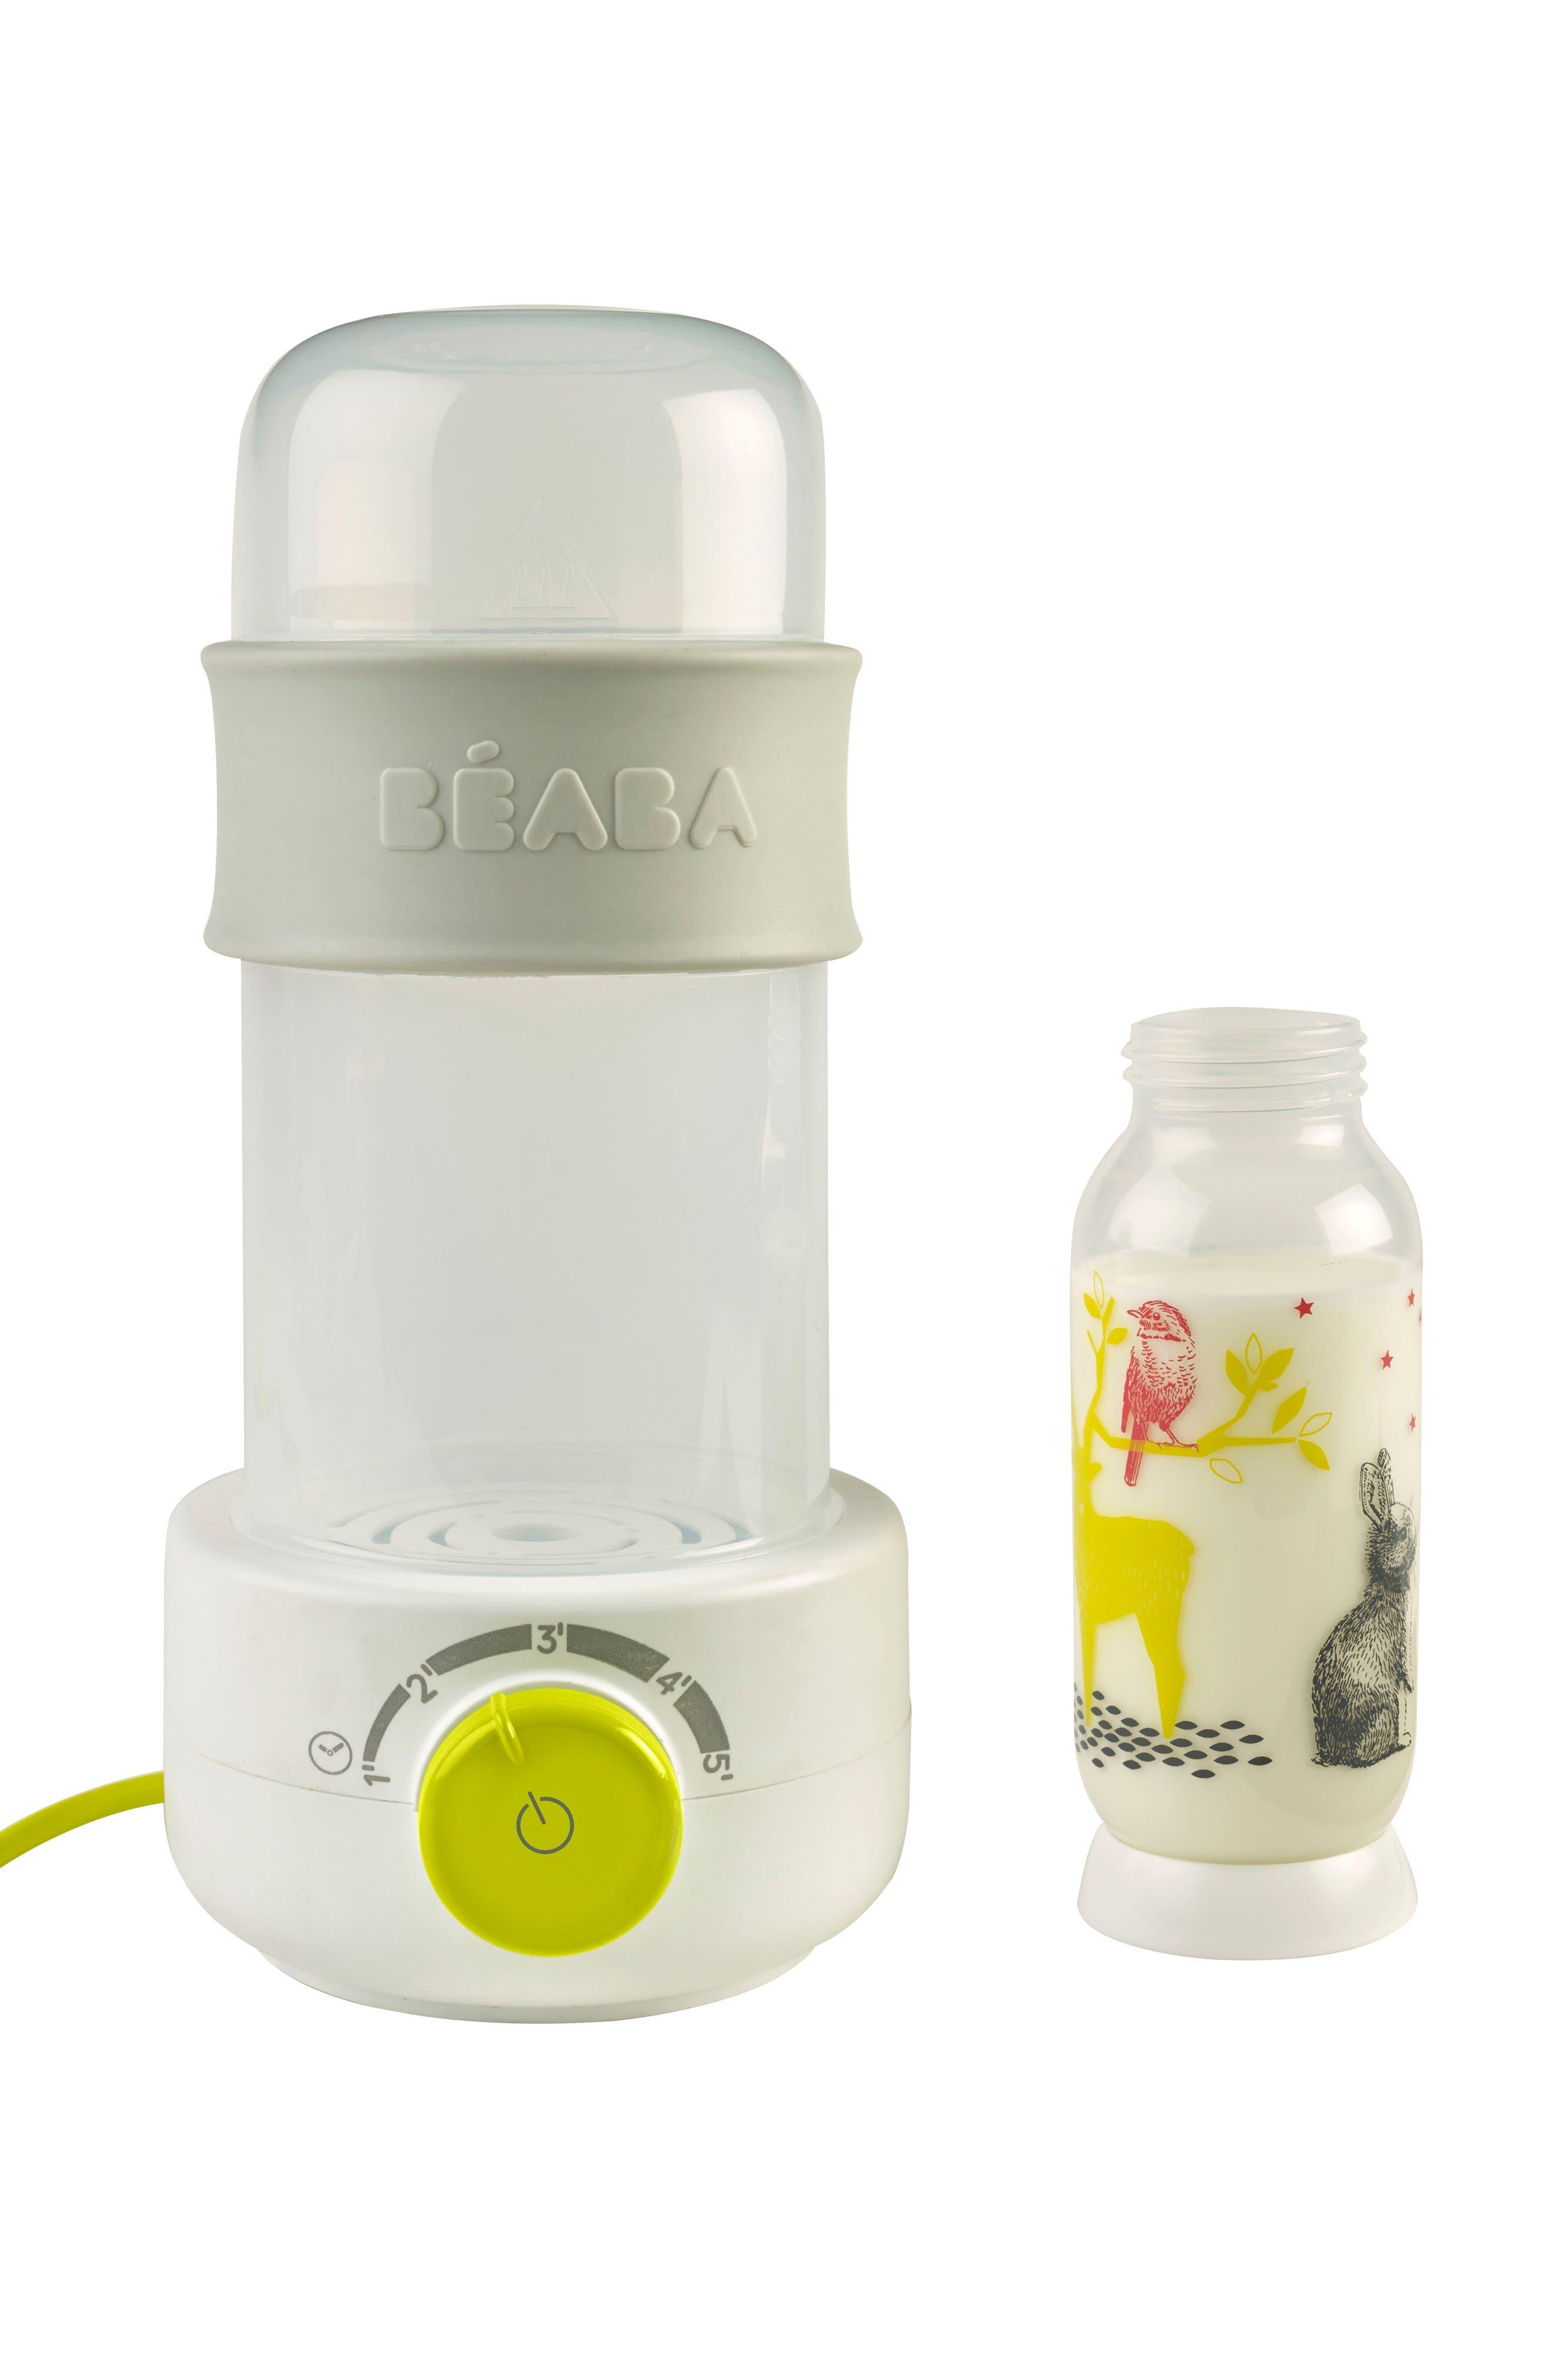 BÉABA Baby Milk Bottle Warmer